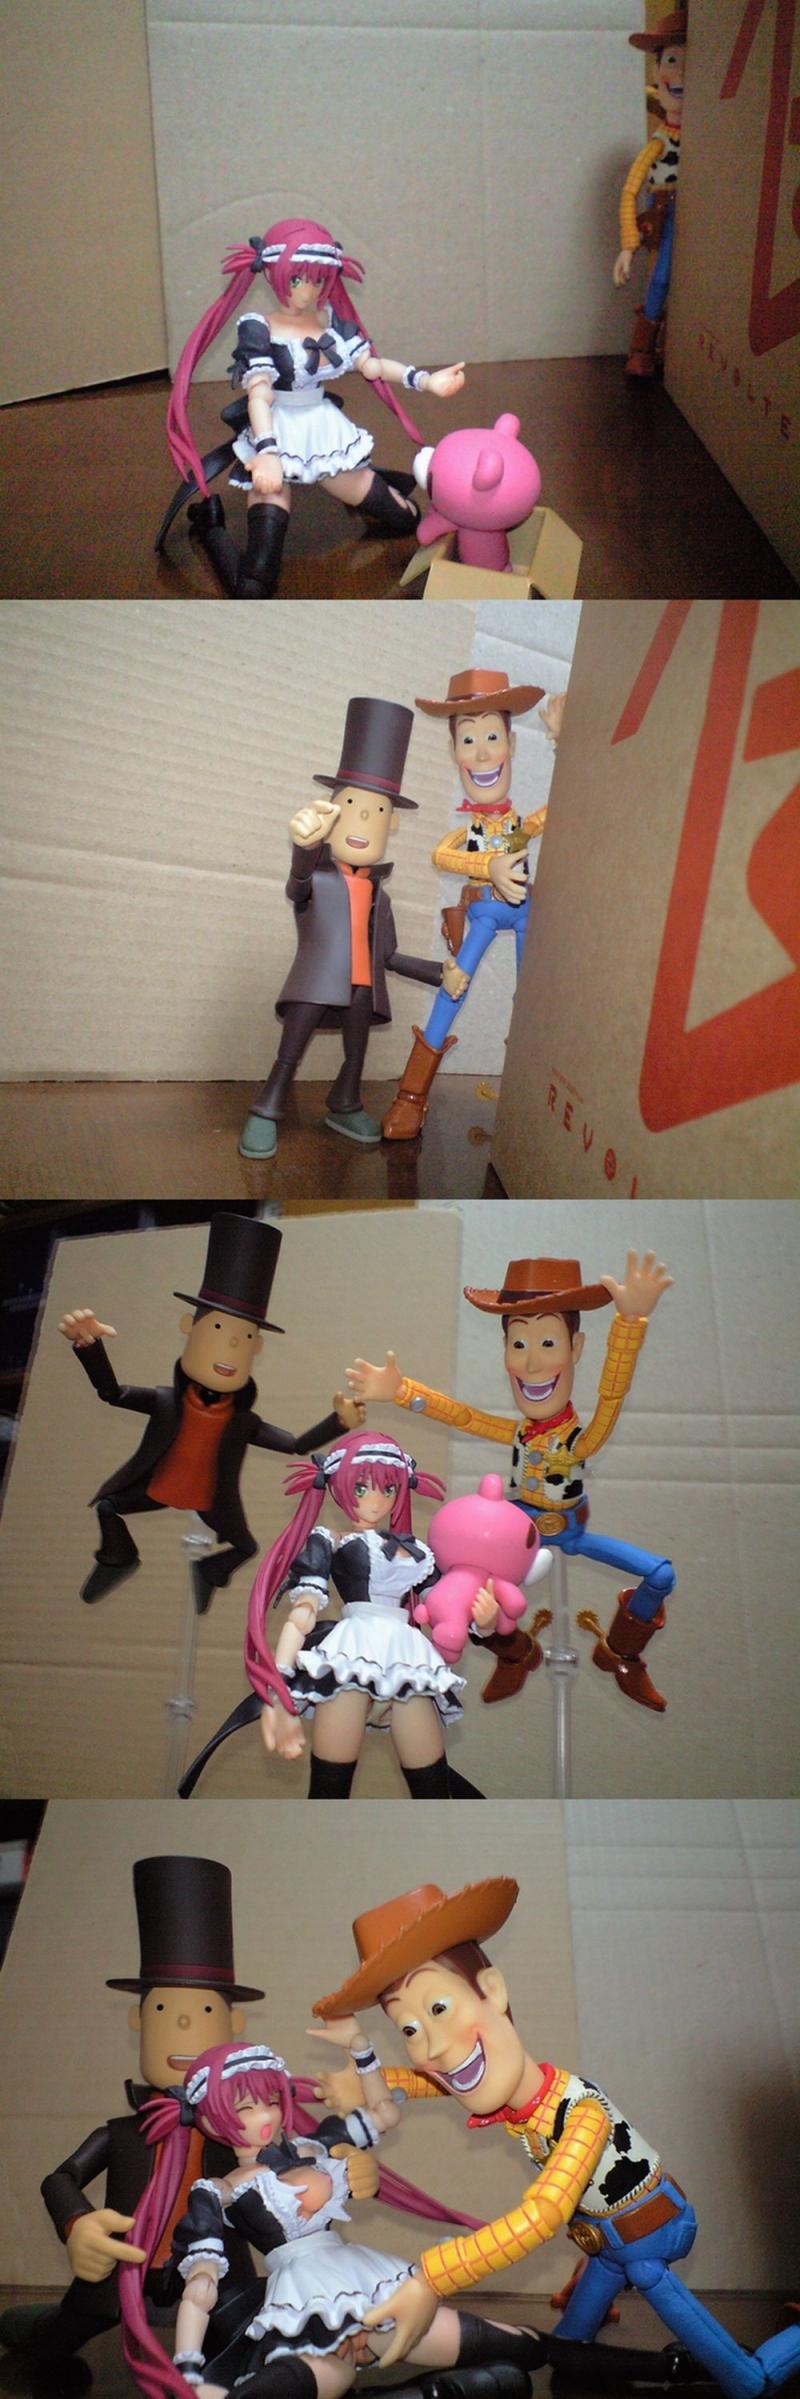 508486 - Airi Professor_Layton Queen's_Blade Toy_Story Woody crossover hershel_layton.jpg